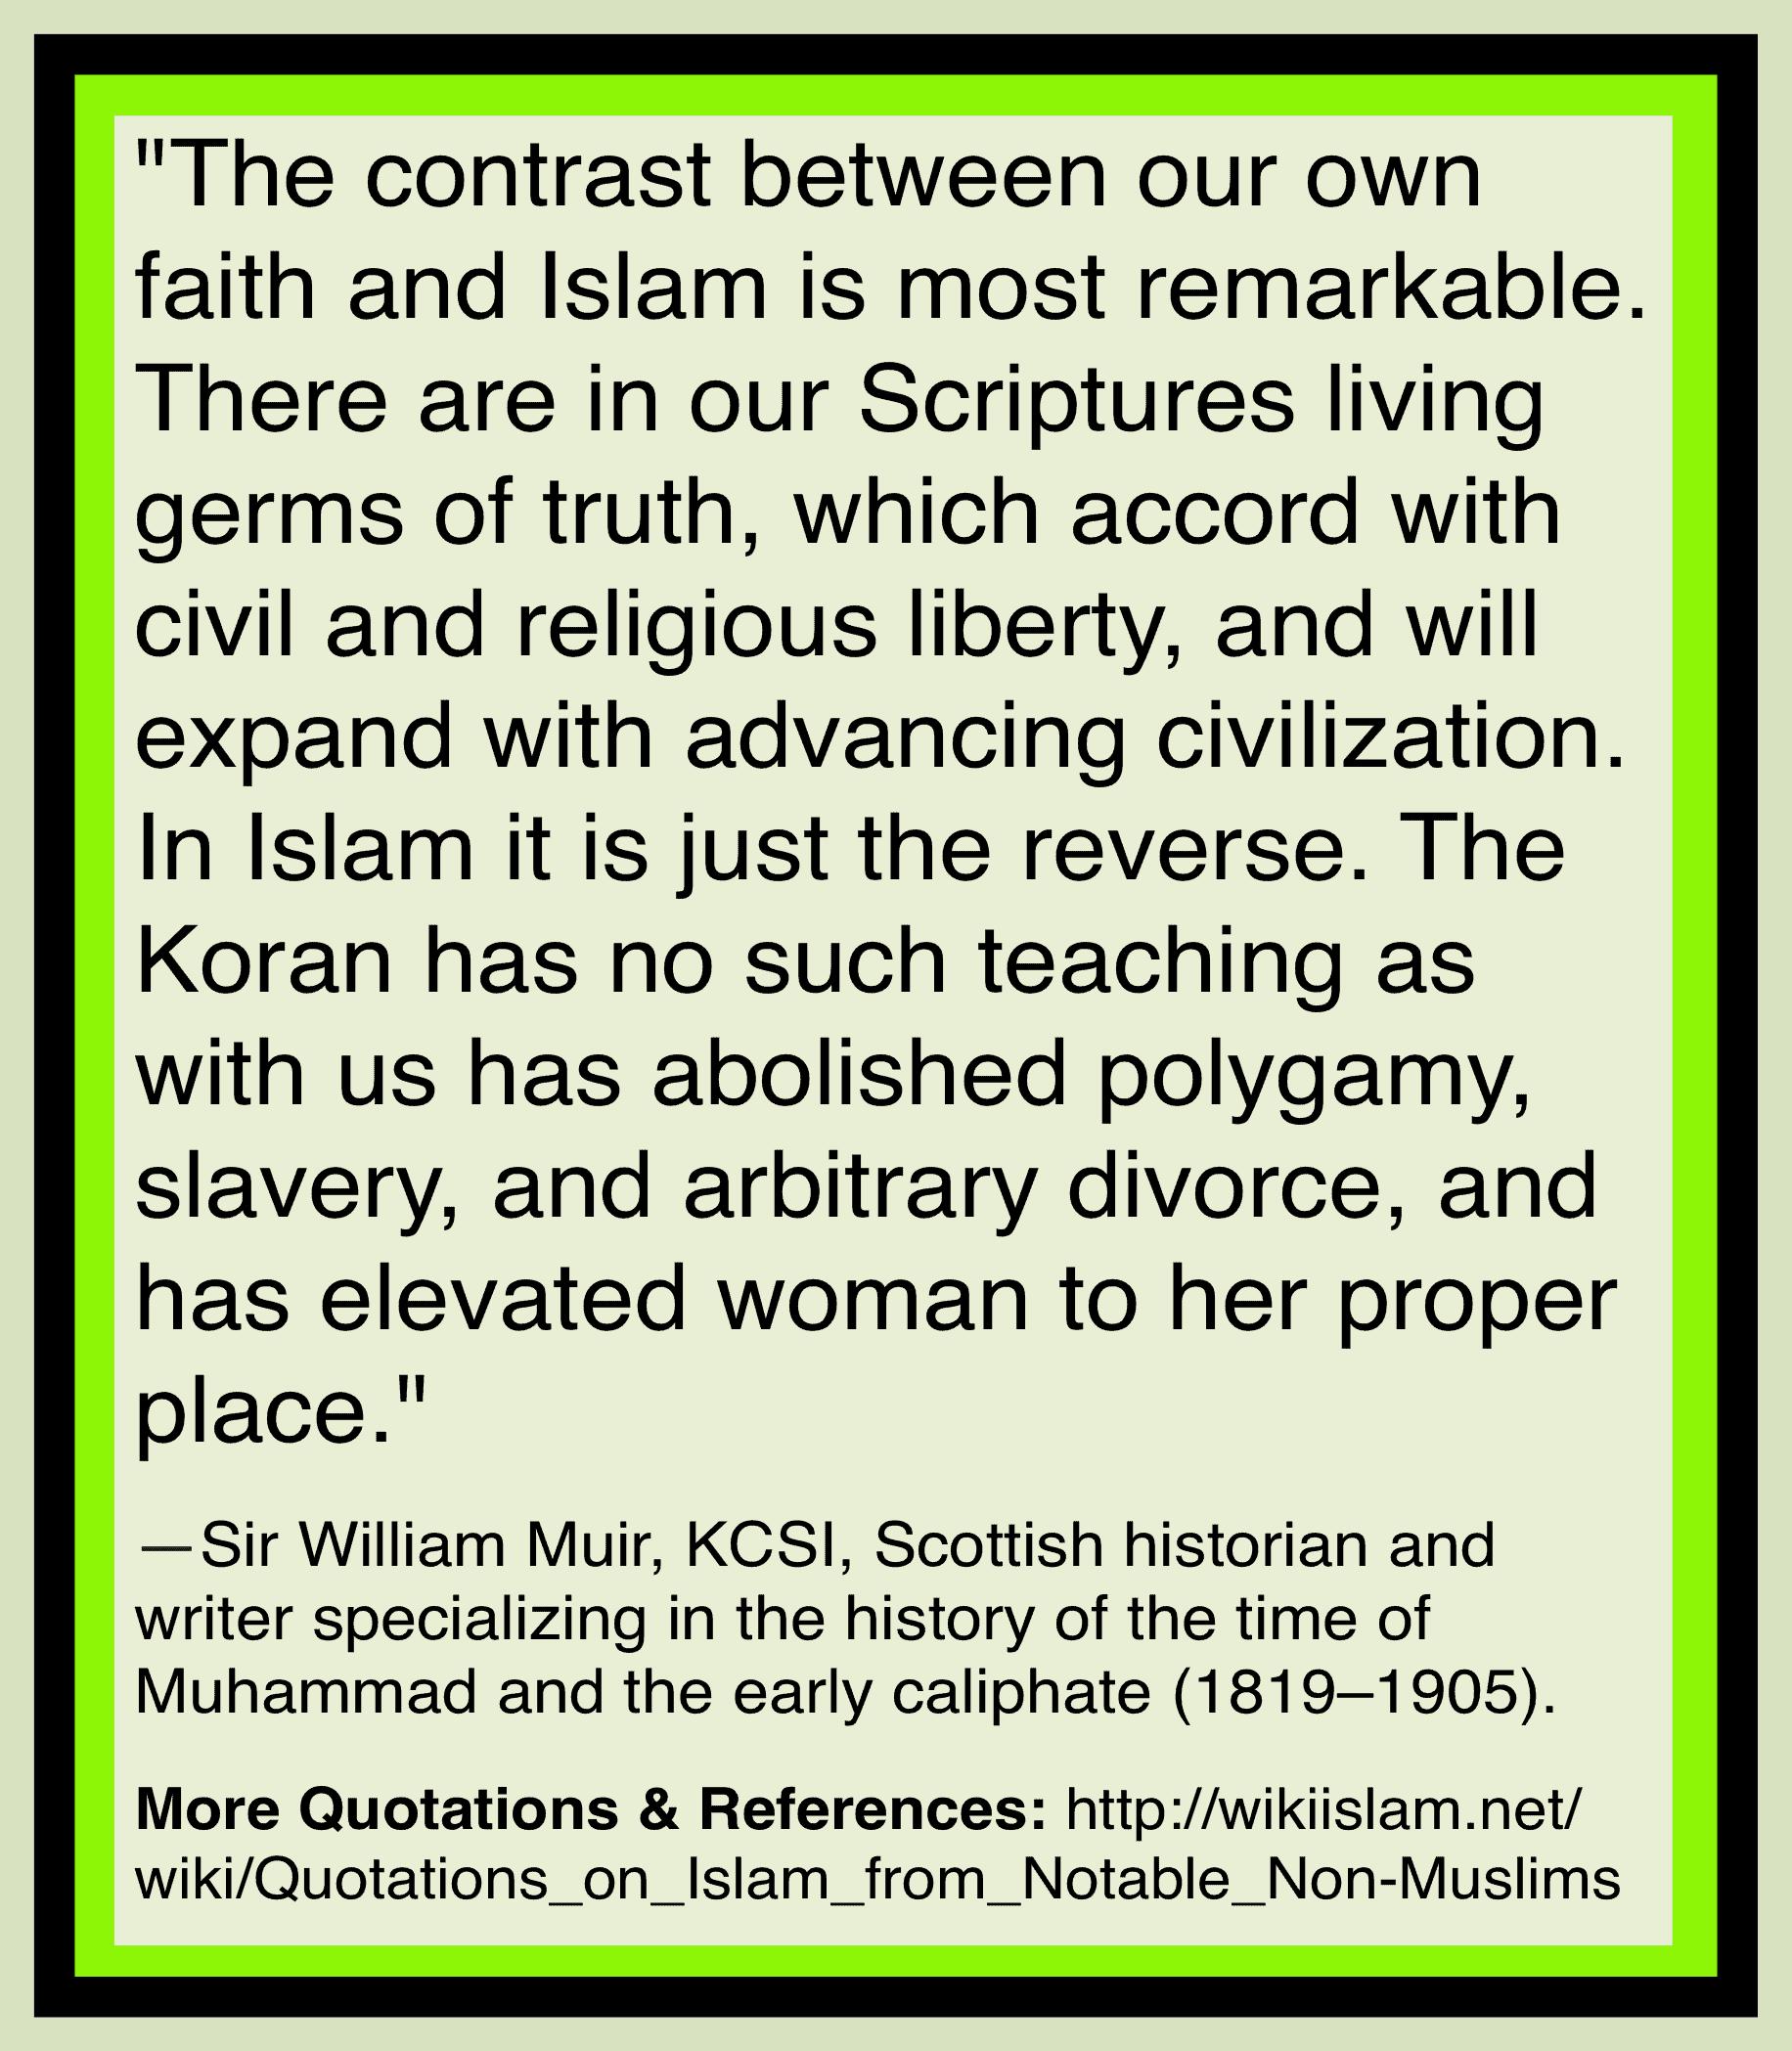 Islam maintains evils